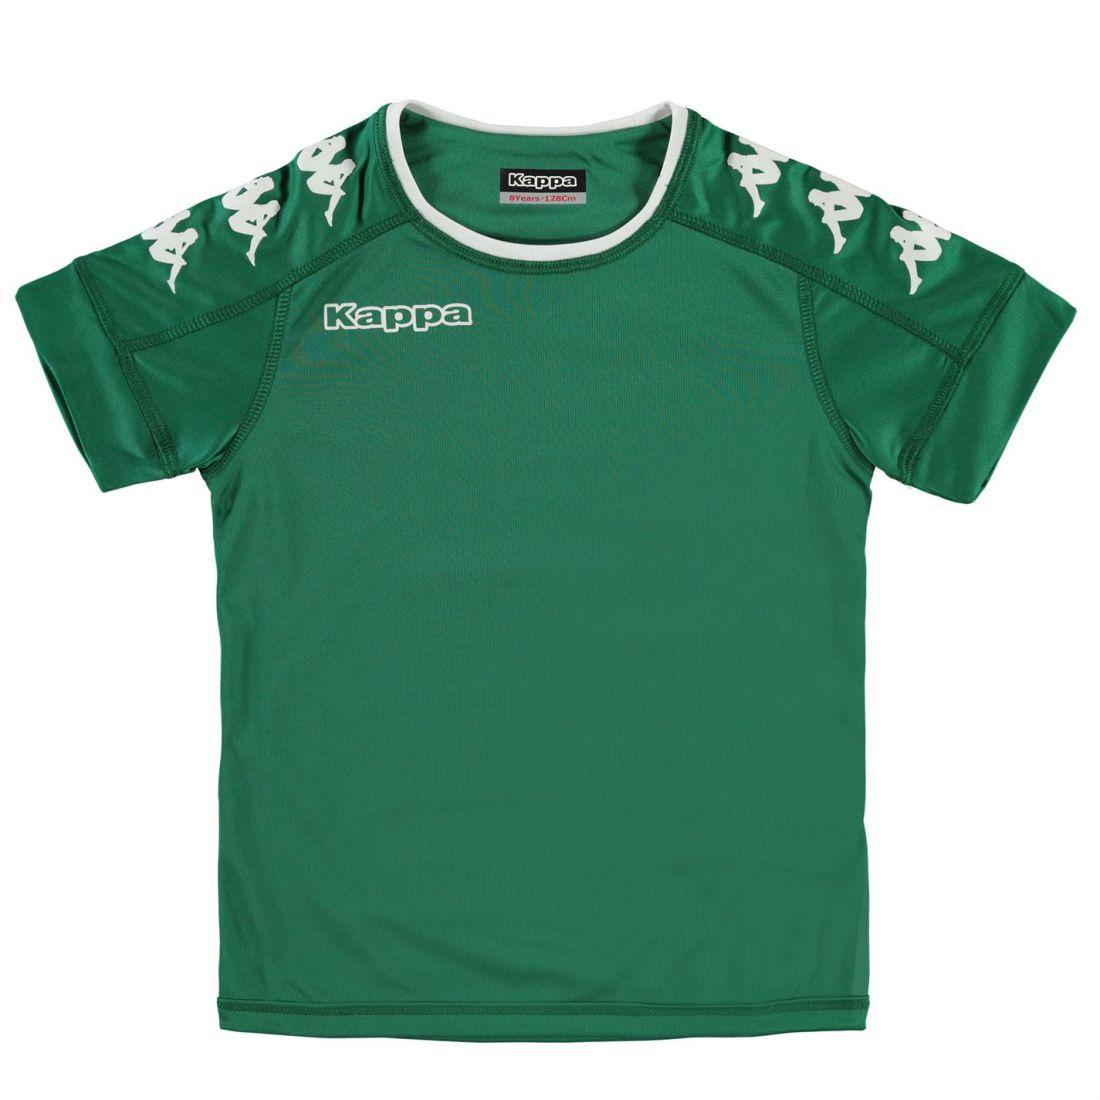 0c125e384294 Kappa Kids Boys Santos Short Sleeve T Shirt Junior Crew Neck Tee Top ...